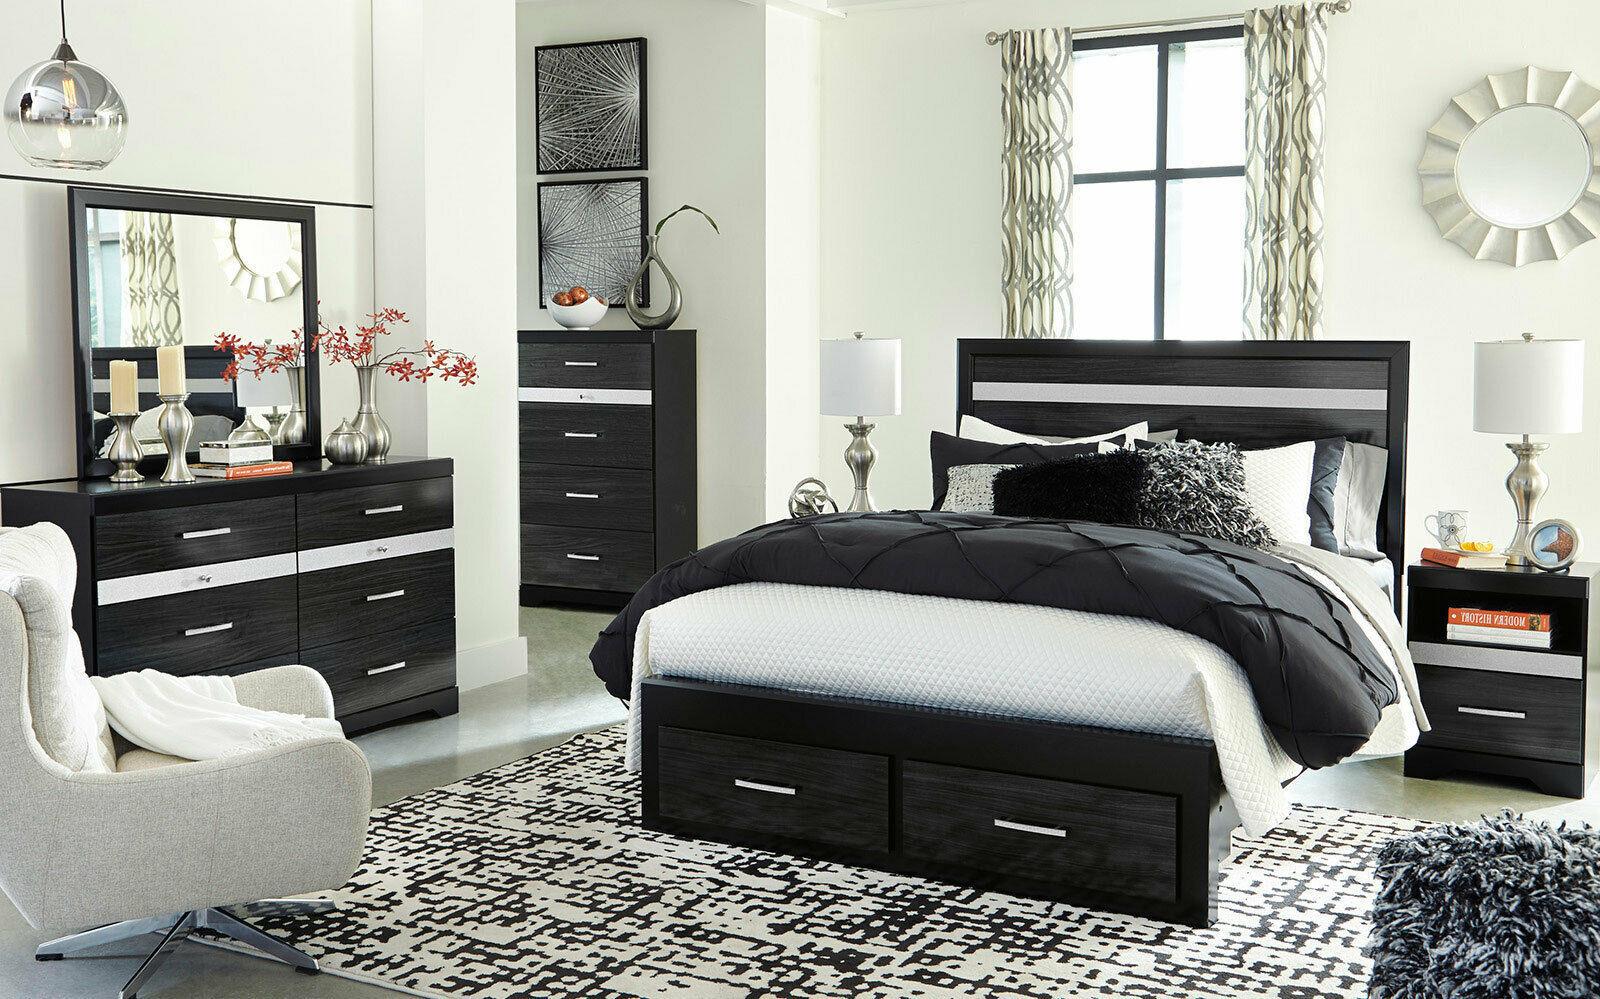 PRIMA 5 Pieces Modern Black Bedroom Suite W. King Size